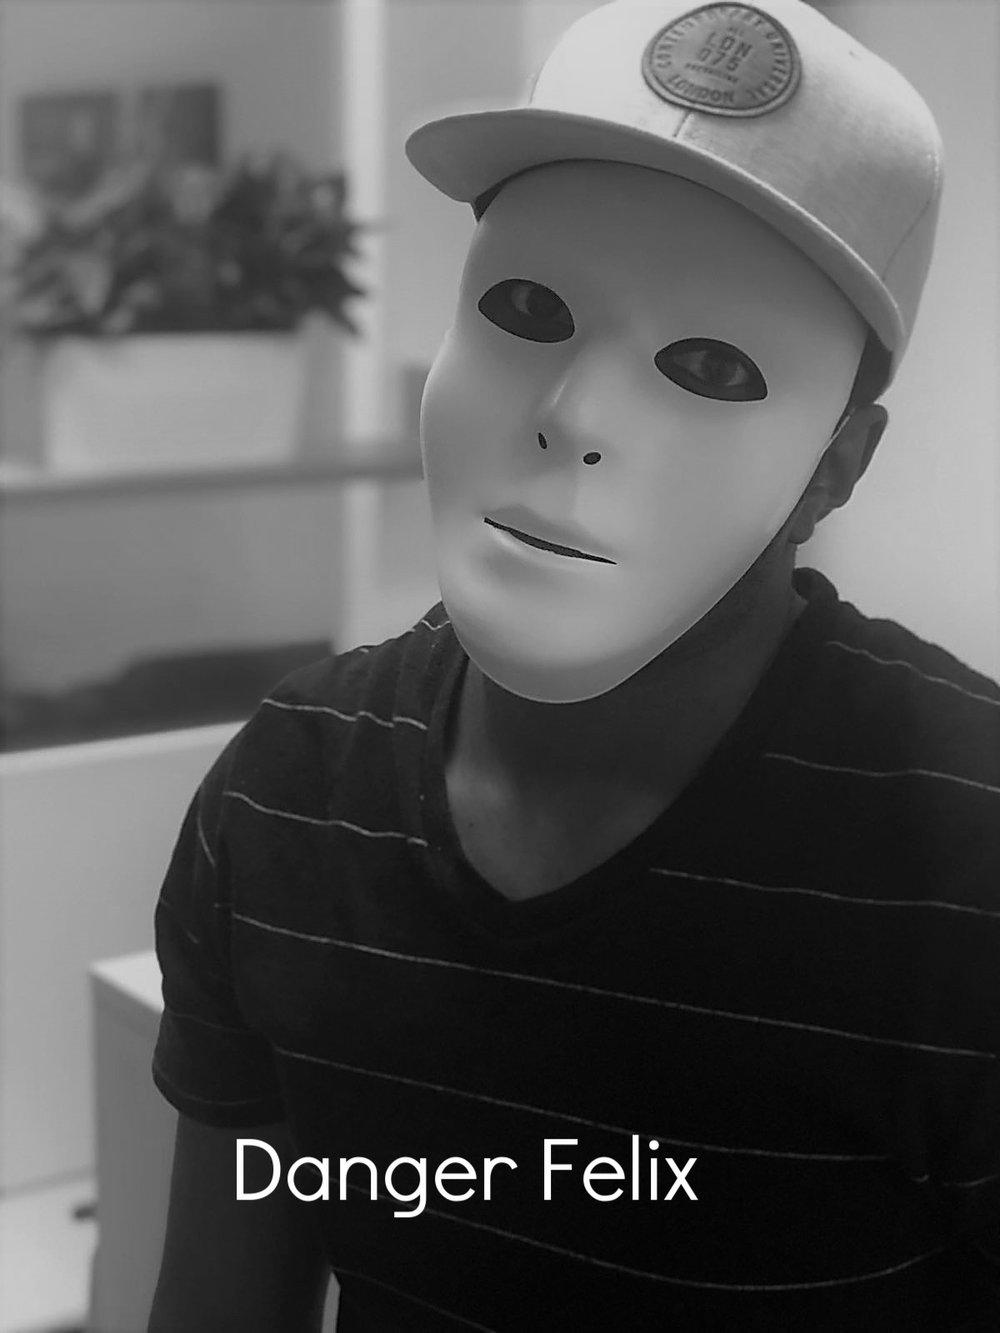 Danger Felix